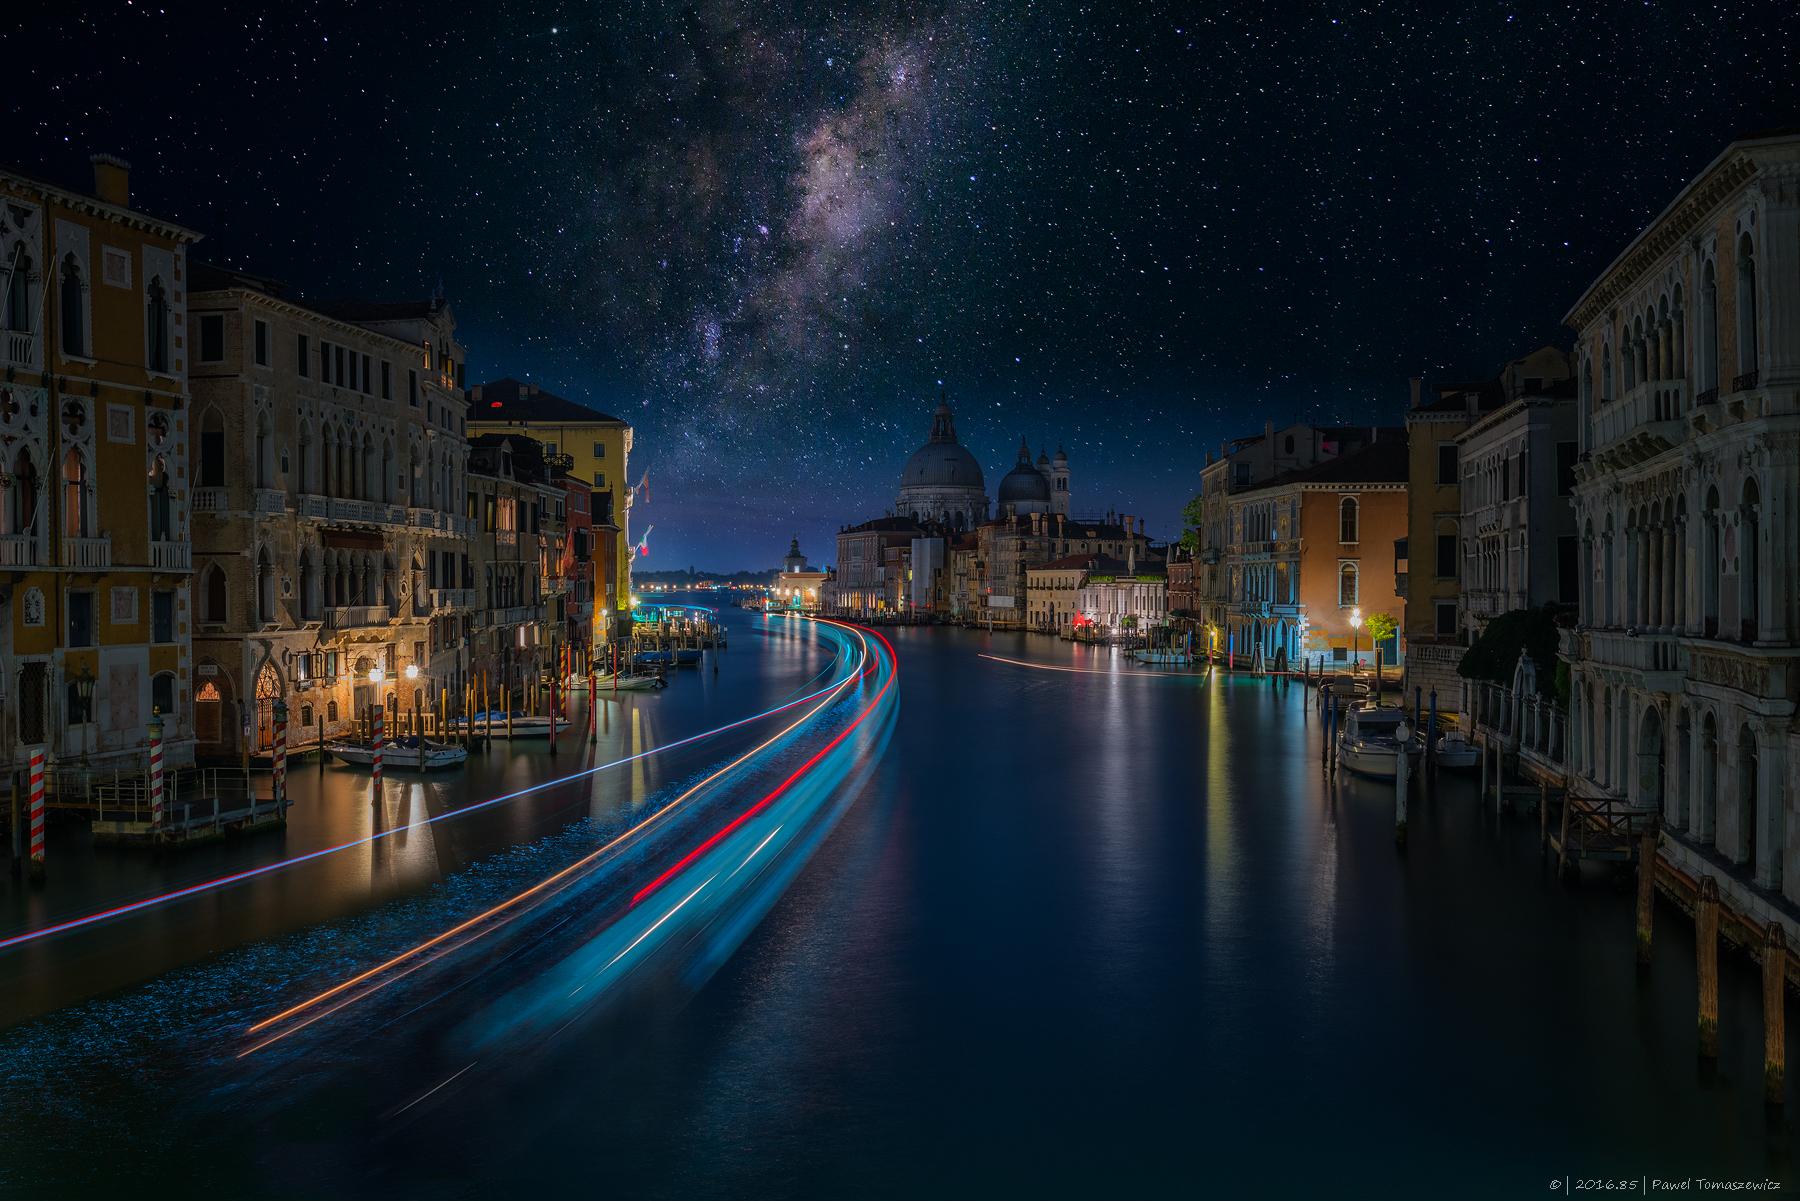 Venice - Accademia Bridge - Basilica di Santa Maria, Italy